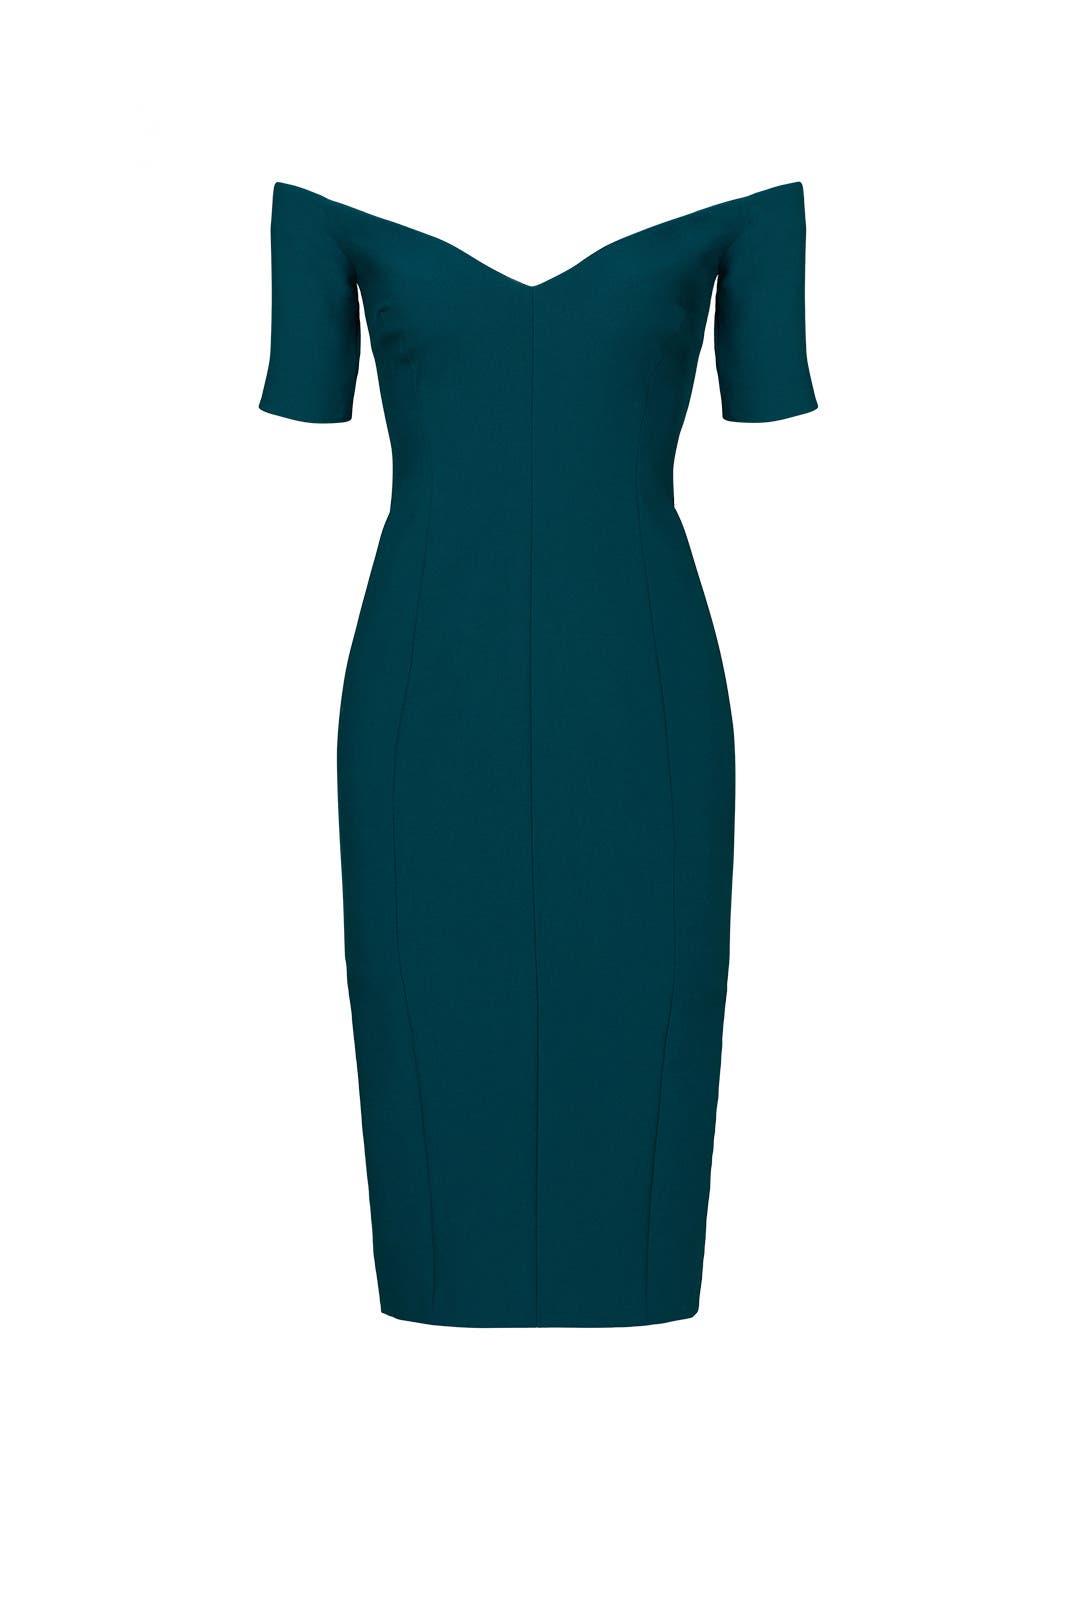 Teal Jolie Dress by Cinq à Sept